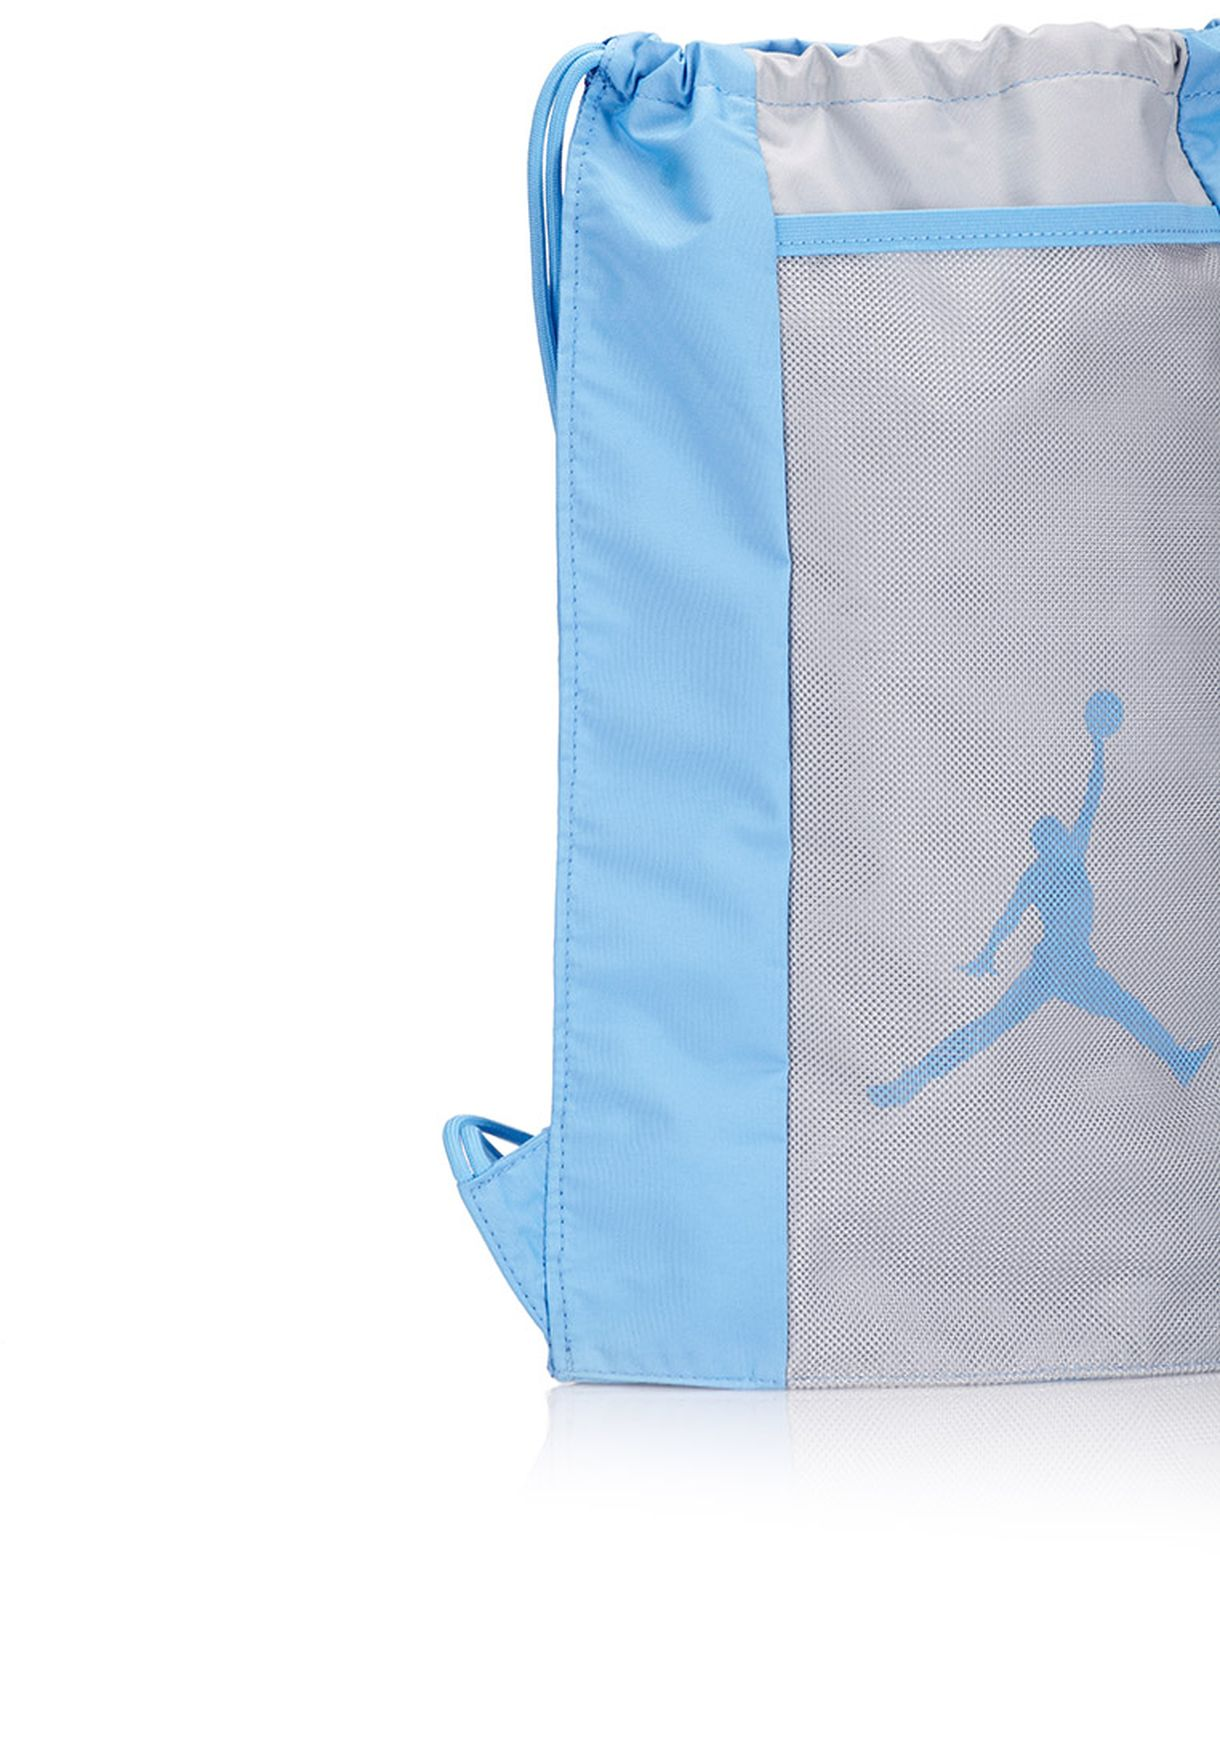 dce9b1c4f208 Shop Nike blue Jordan Dominate Gymsack 612839-412 for Men in ...